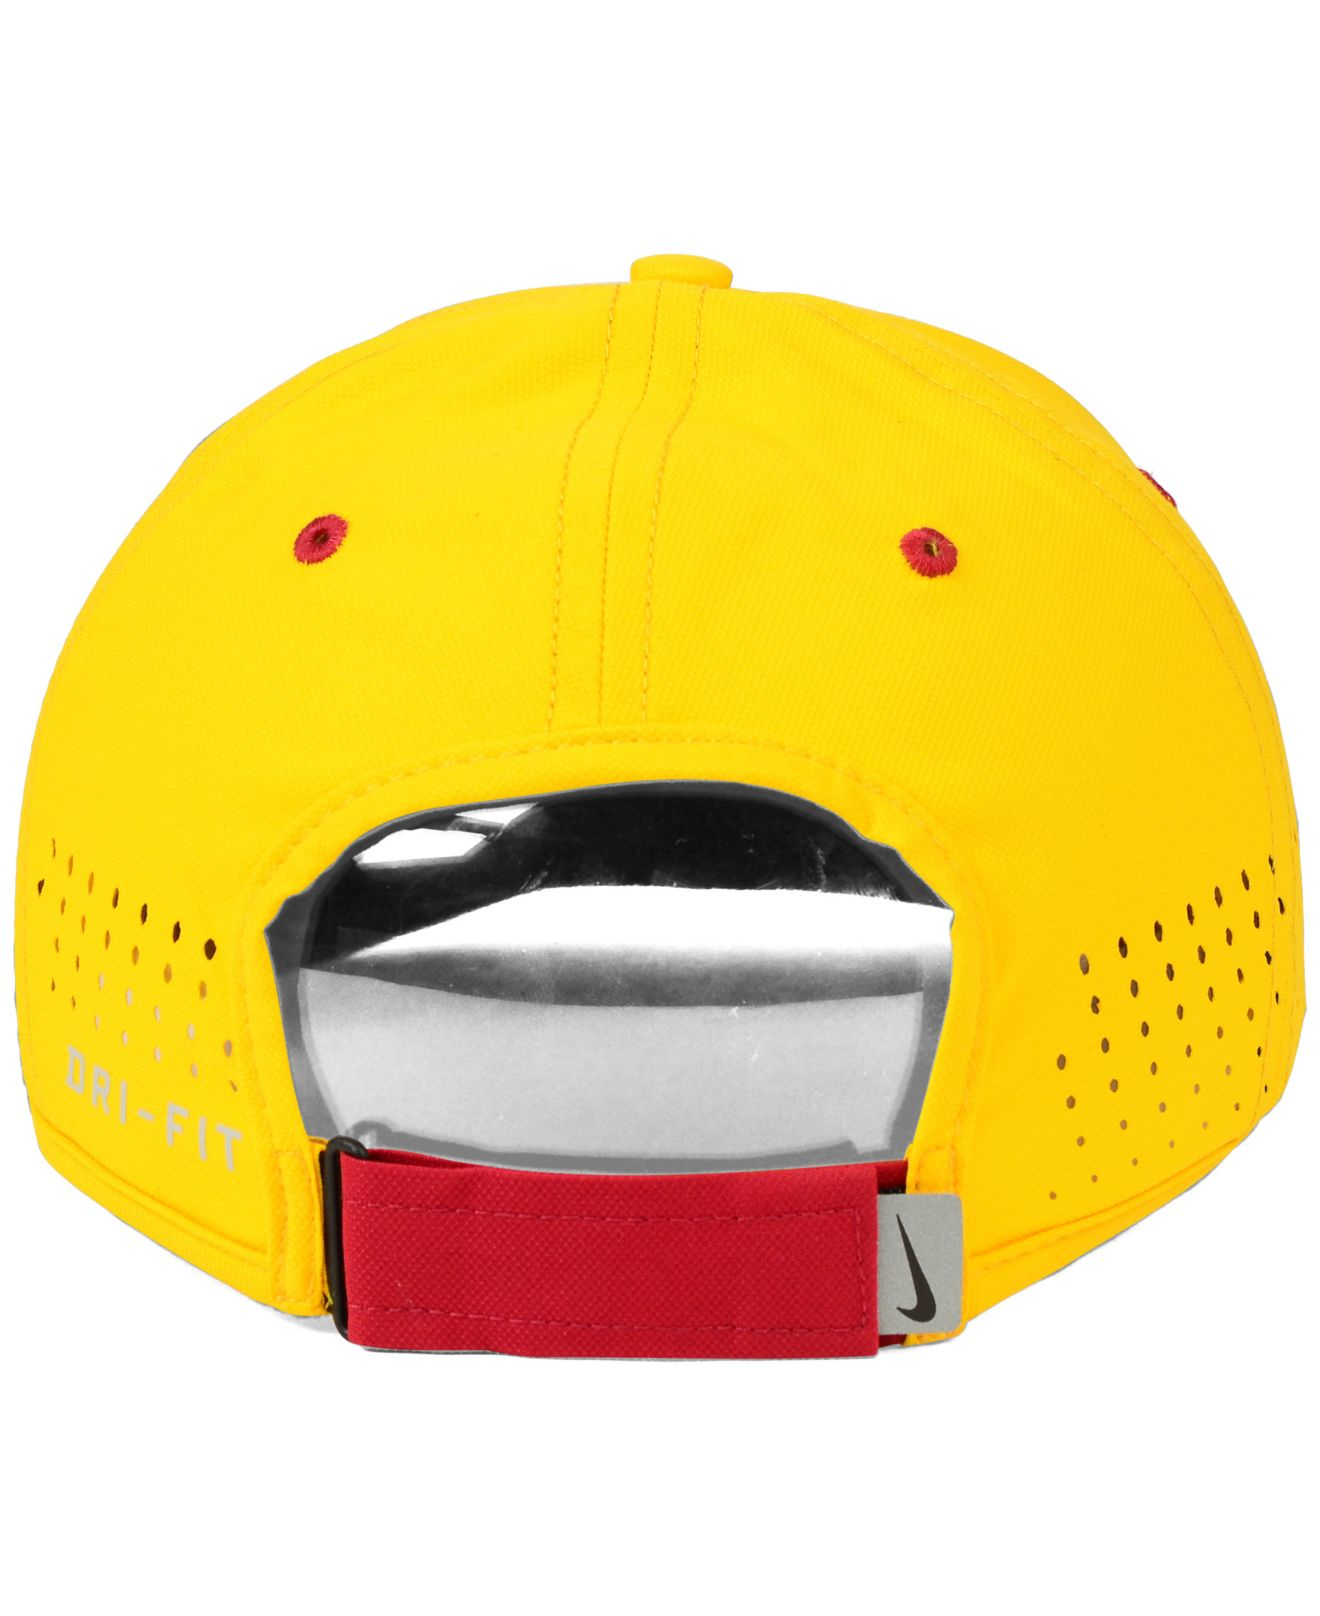 58f49a528aafb ... denmark lyst nike usc trojans dri fit coaches cap in yellow for men  5cb6e 8eb74